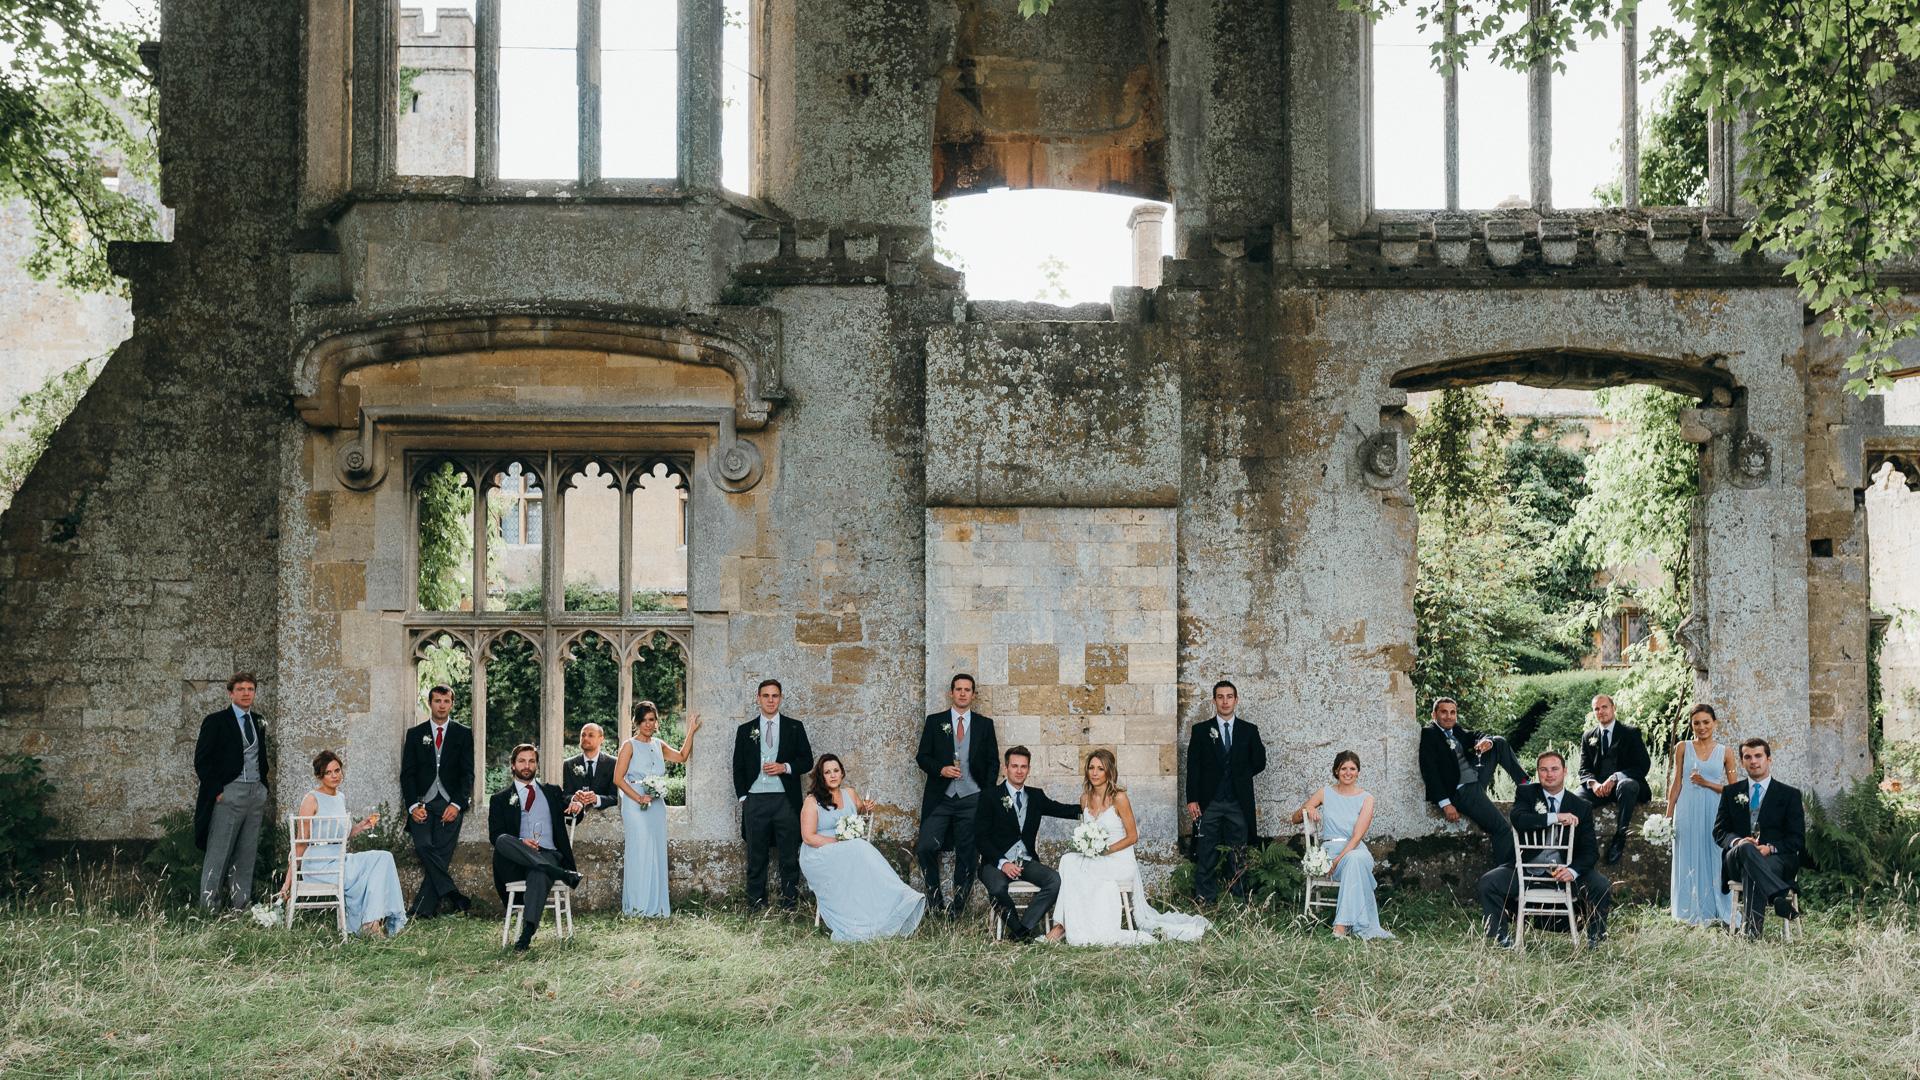 Sudeley castle group photo wedding